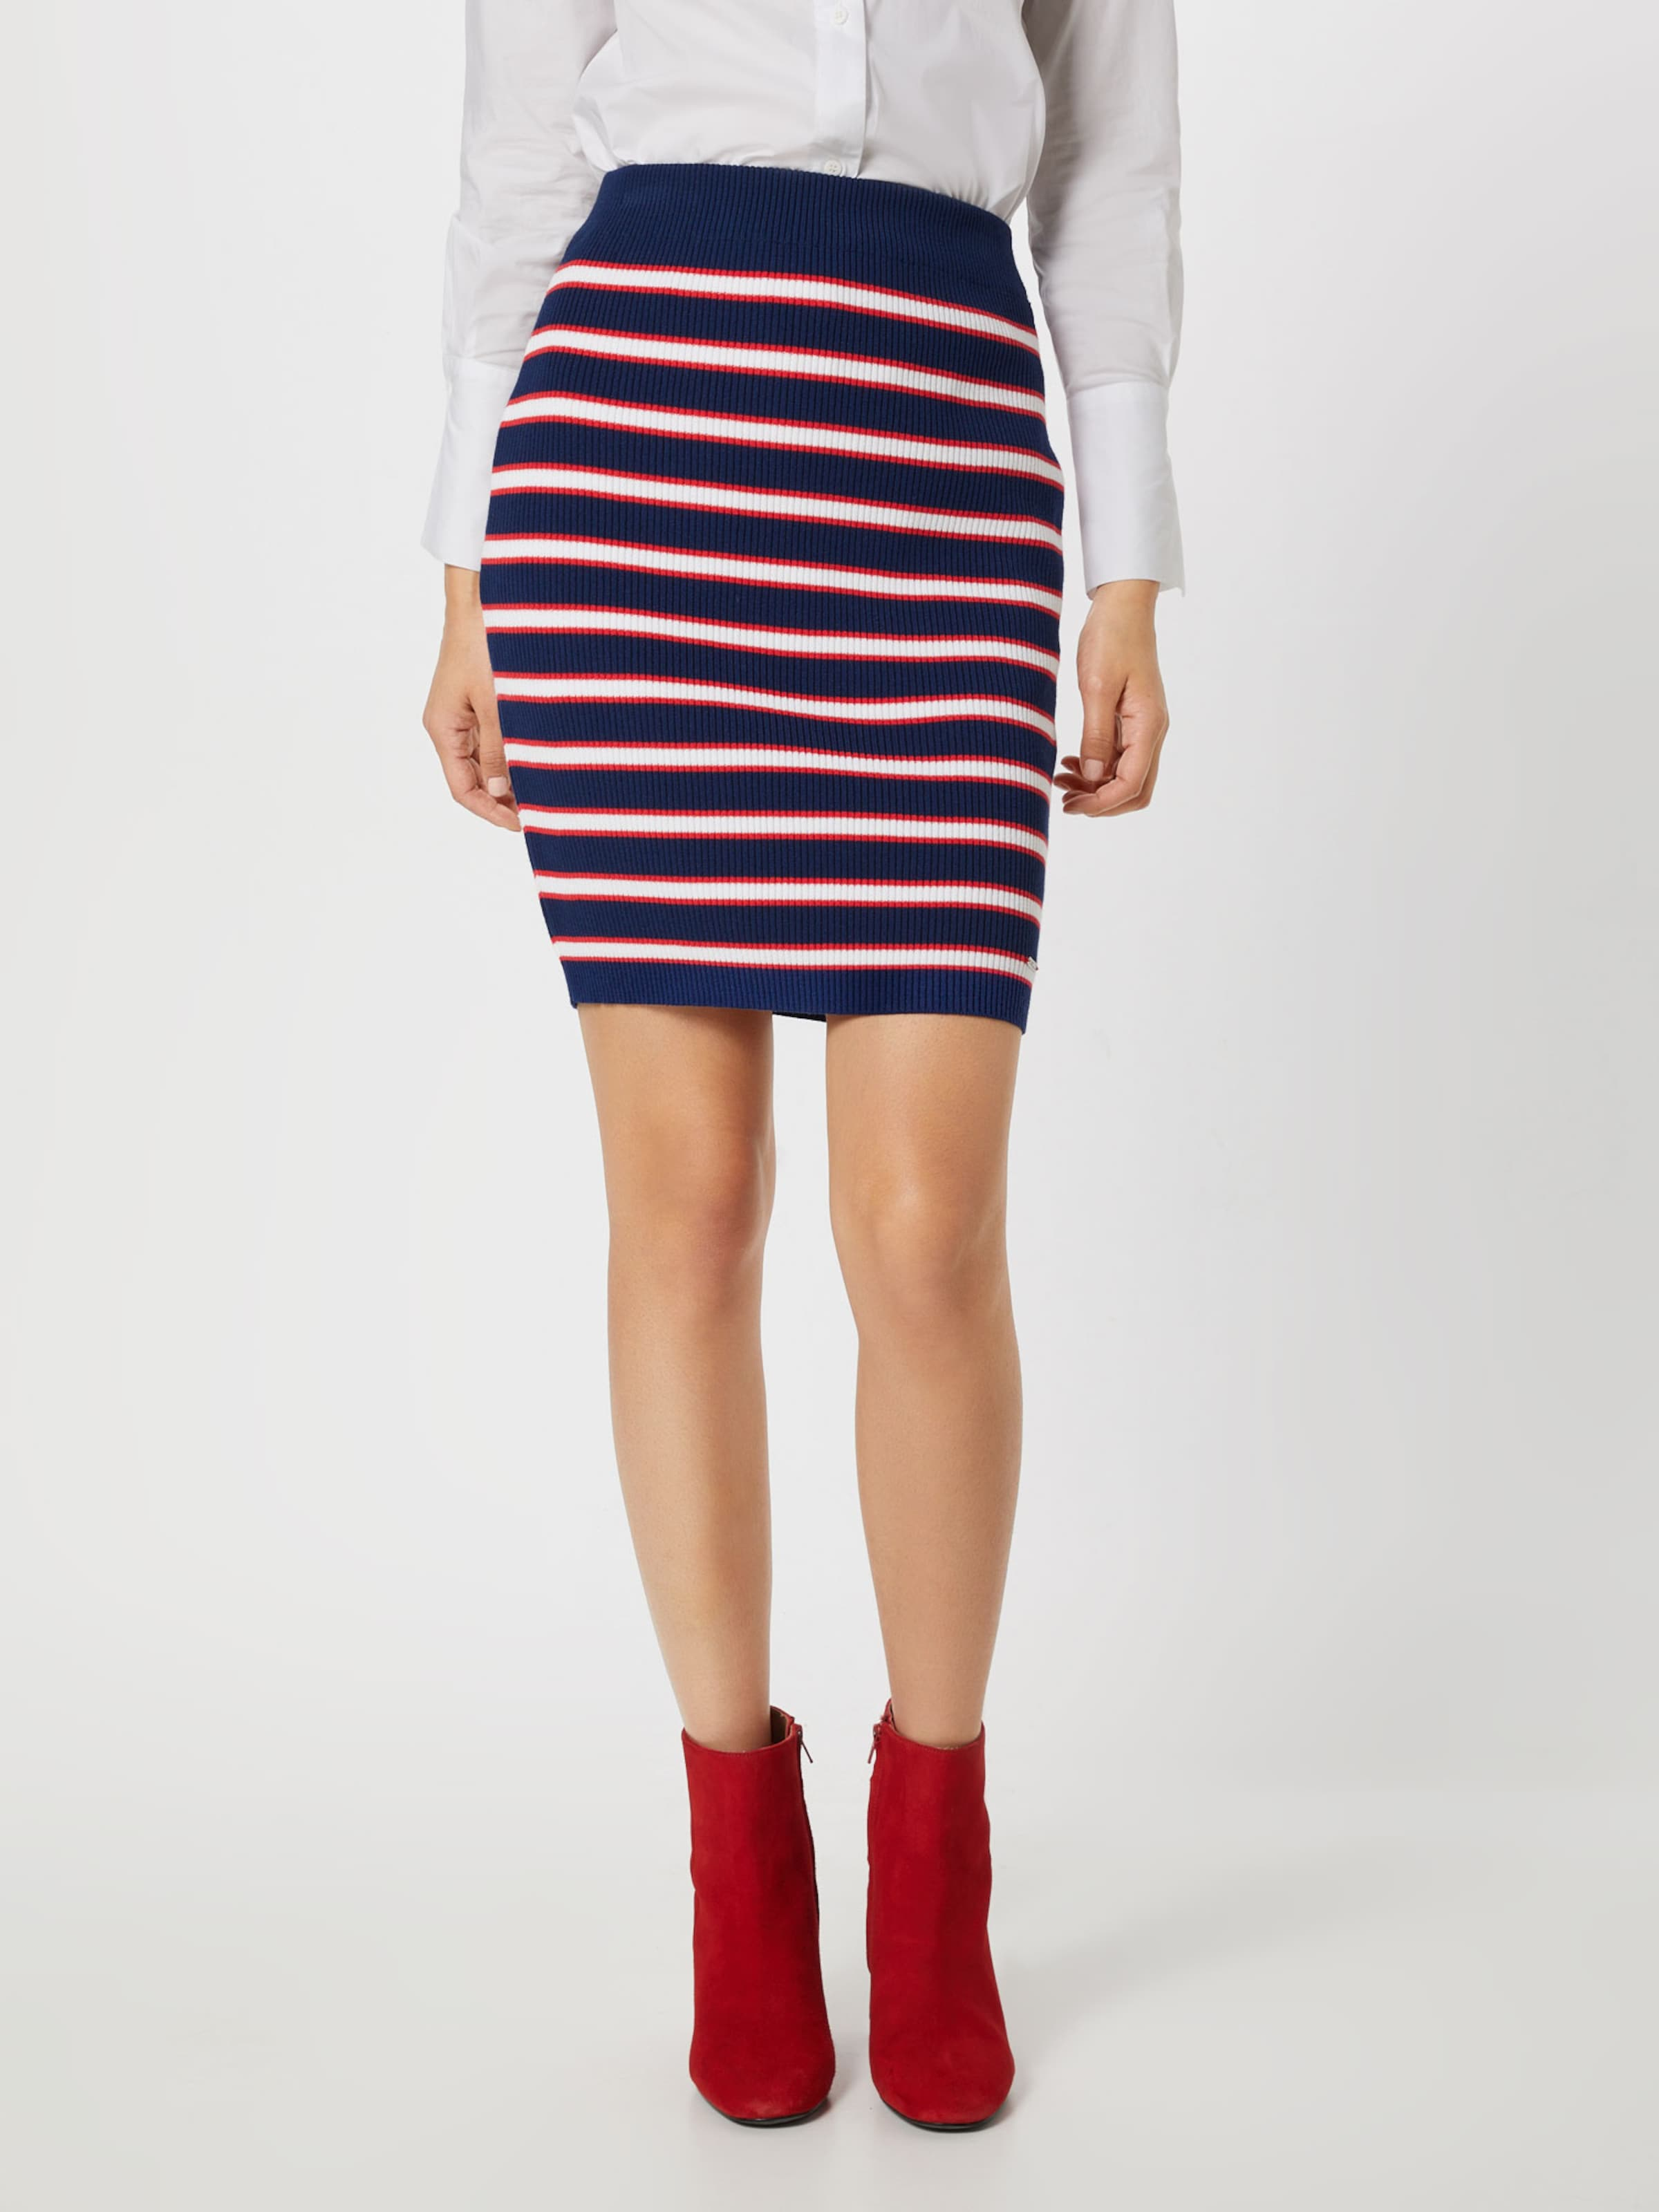 En Guess 'alexandra Skirt' MarineRouge Bleu Sweater Blanc Jupe htsdxrBQC